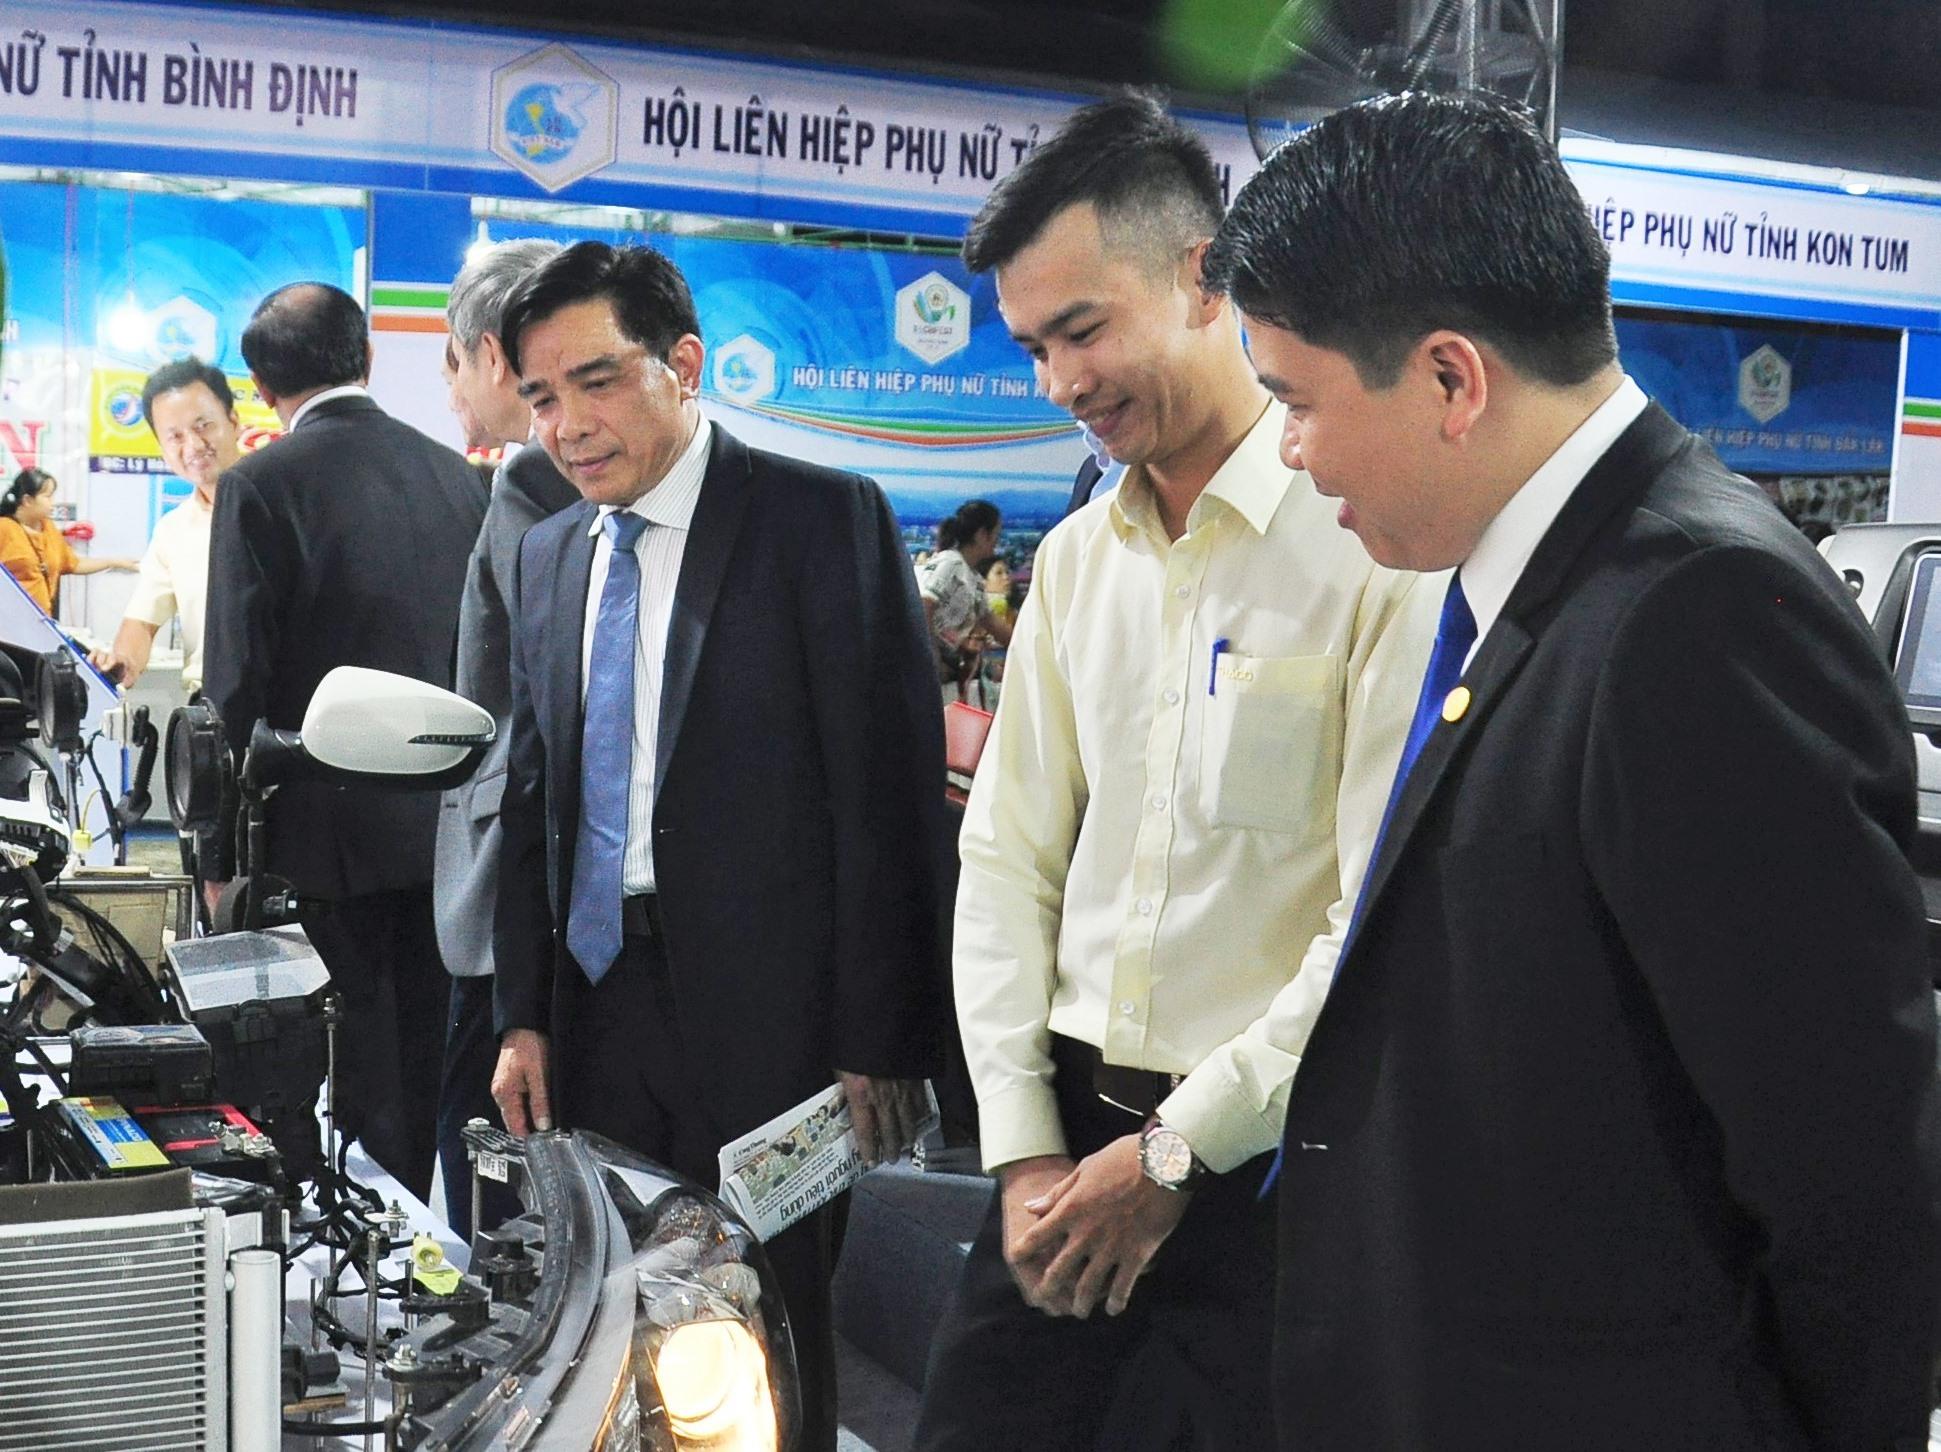 TechFest Quang Nam 2019